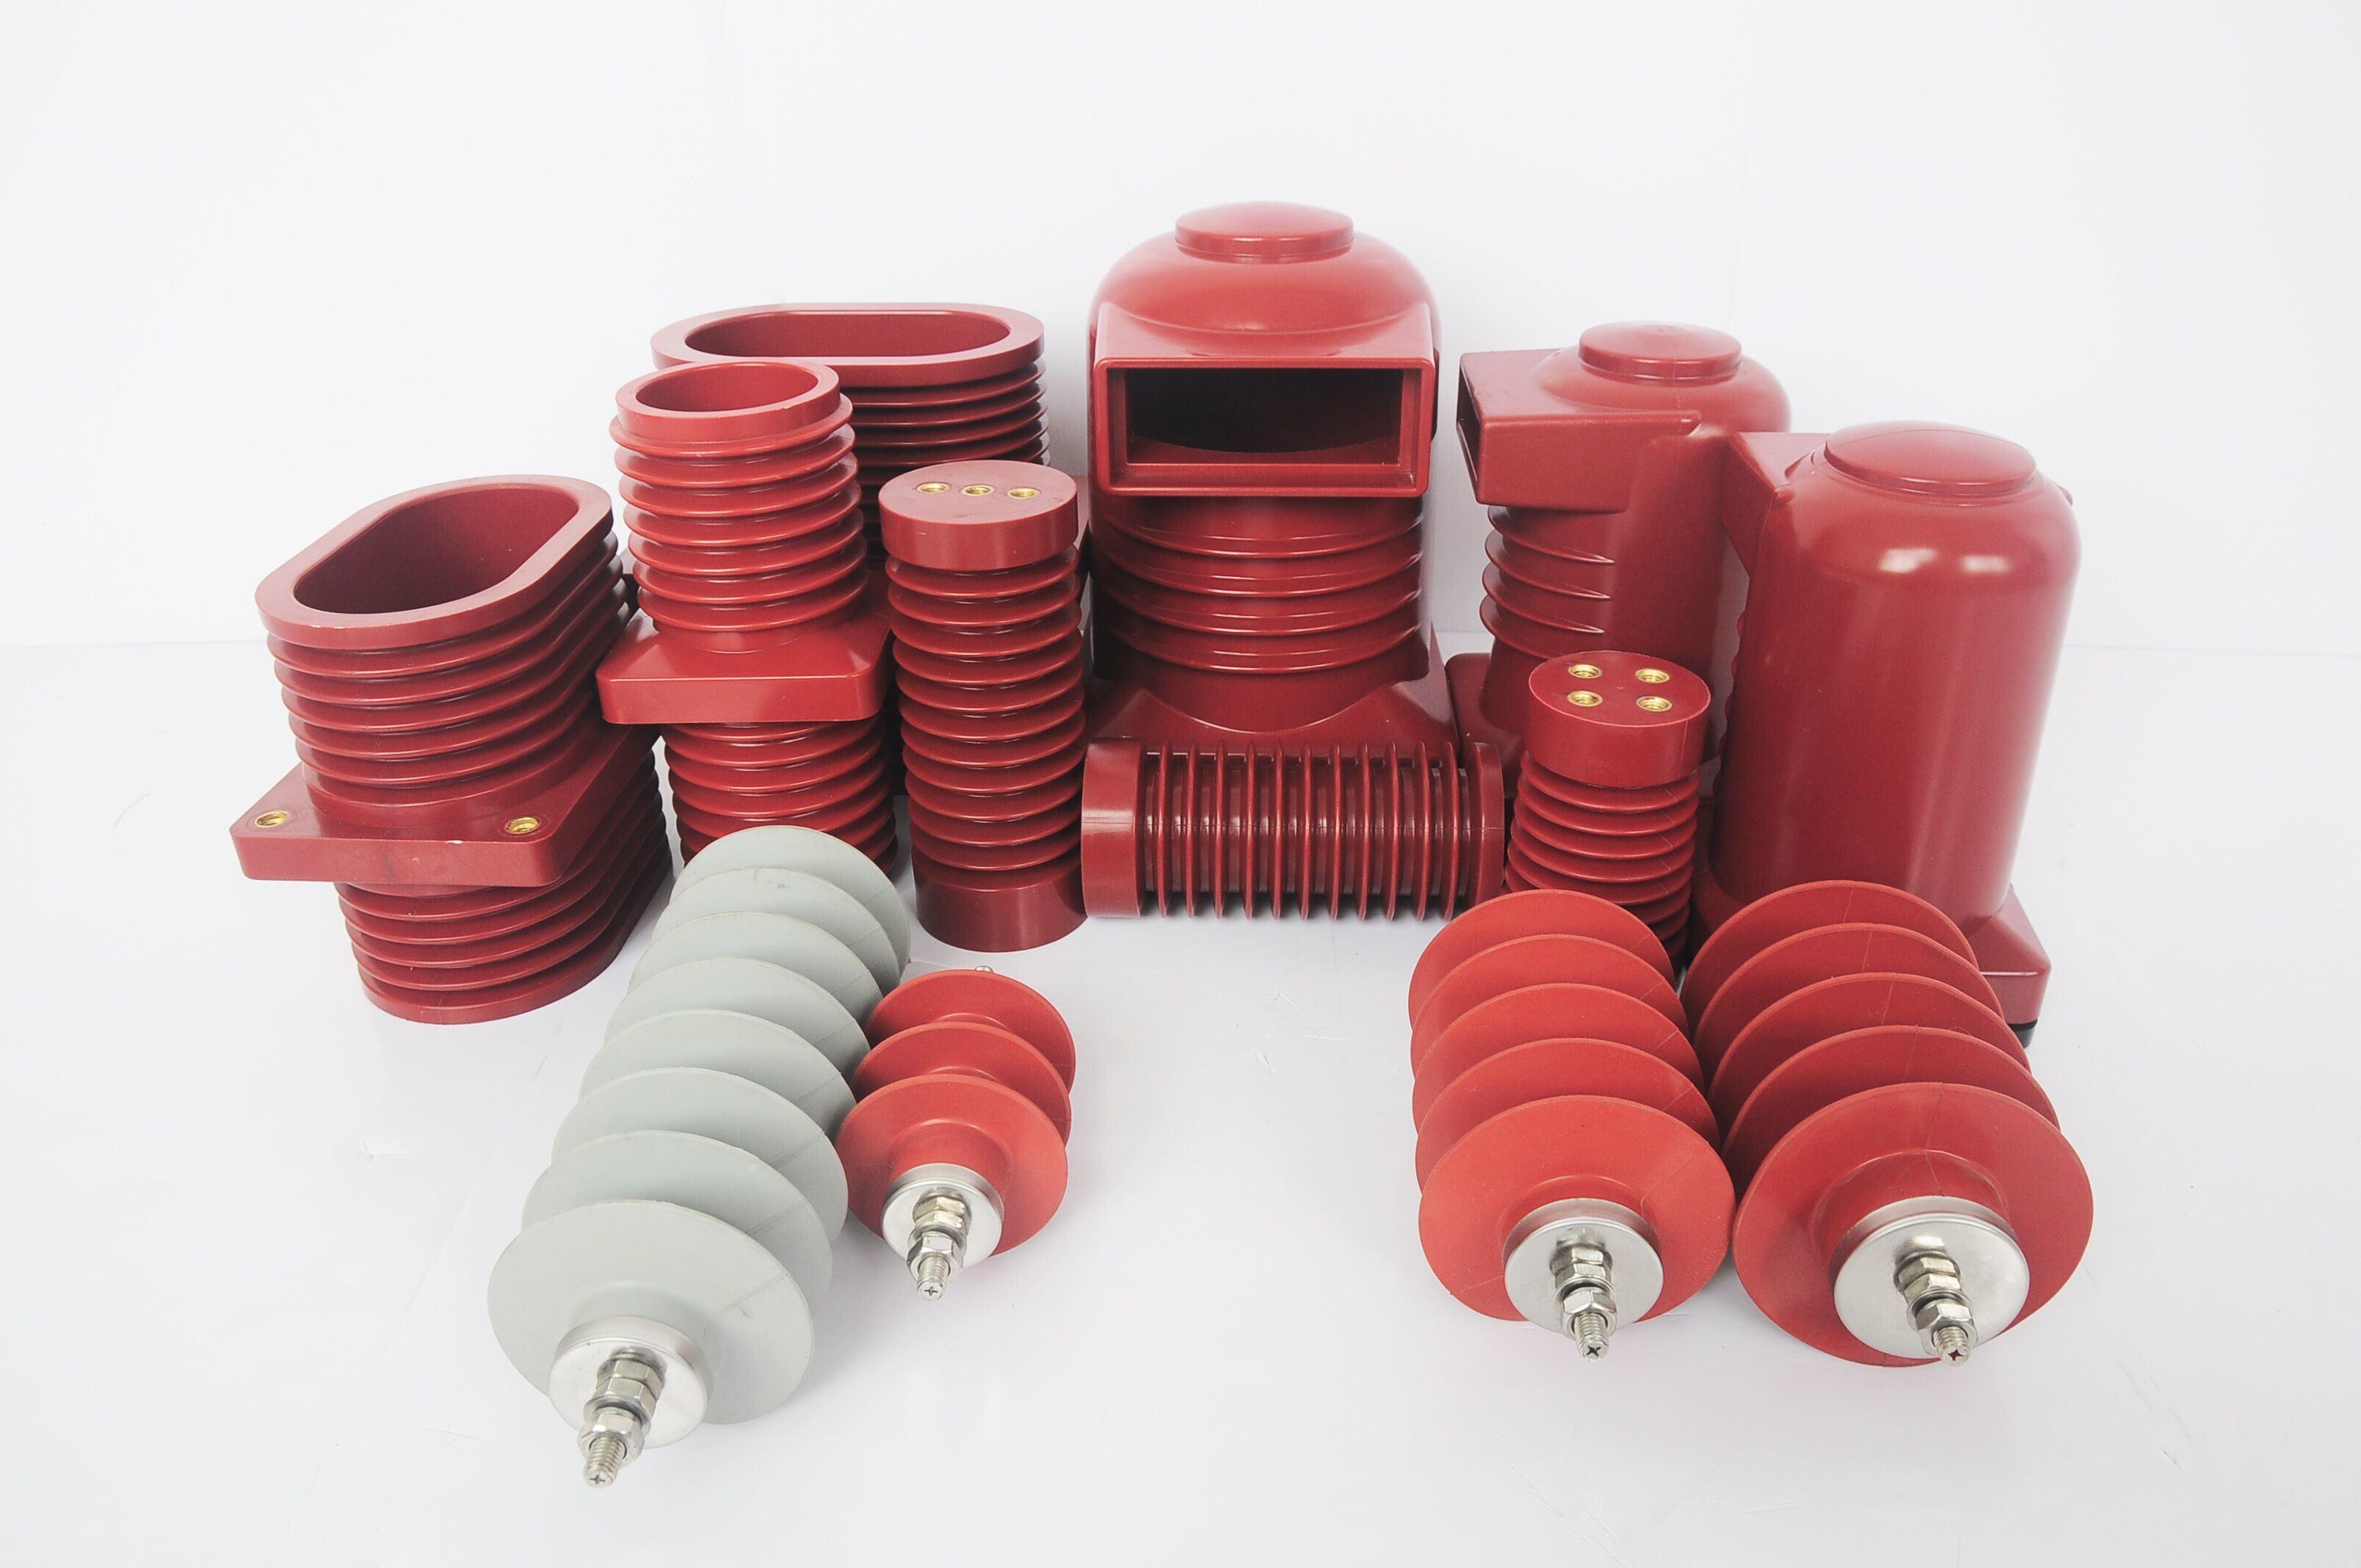 Stong 12kv Switchgears Epoxy Resin Supporting Insulator